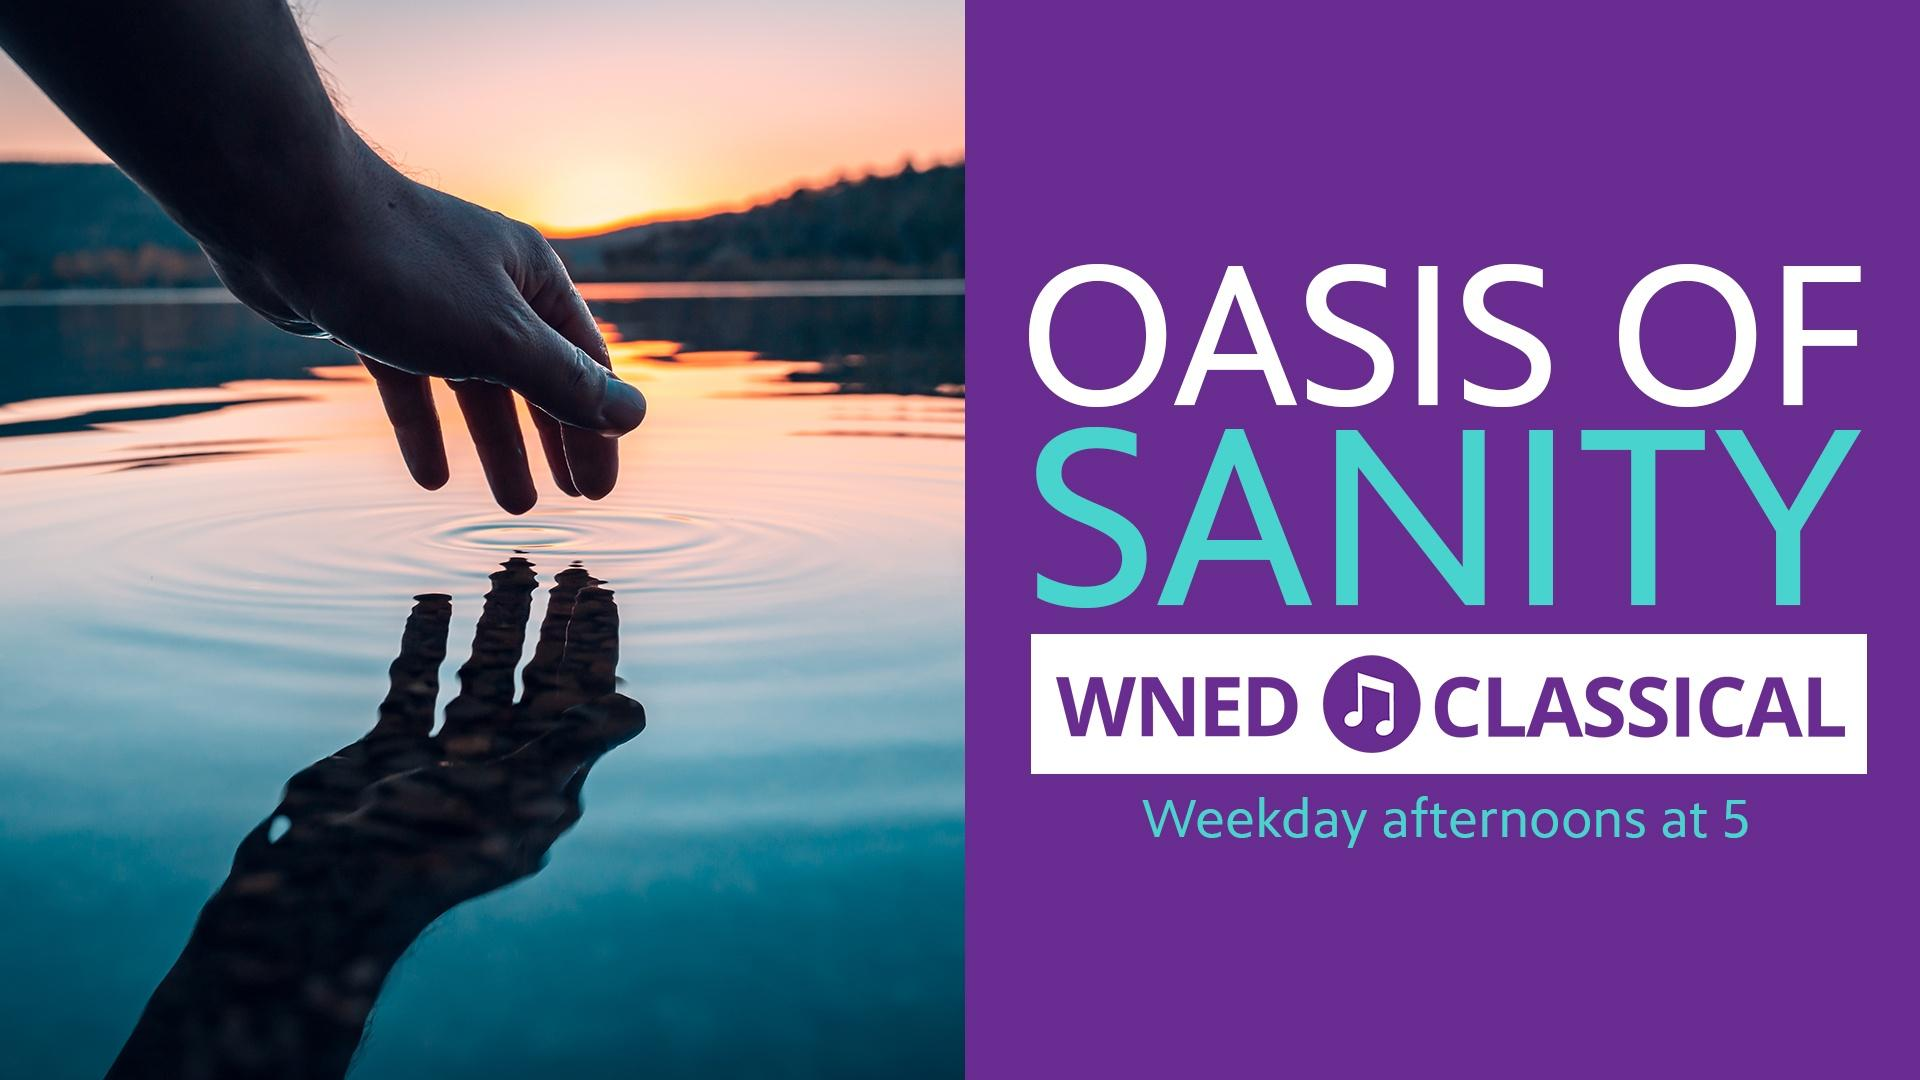 Oasis of Sanity